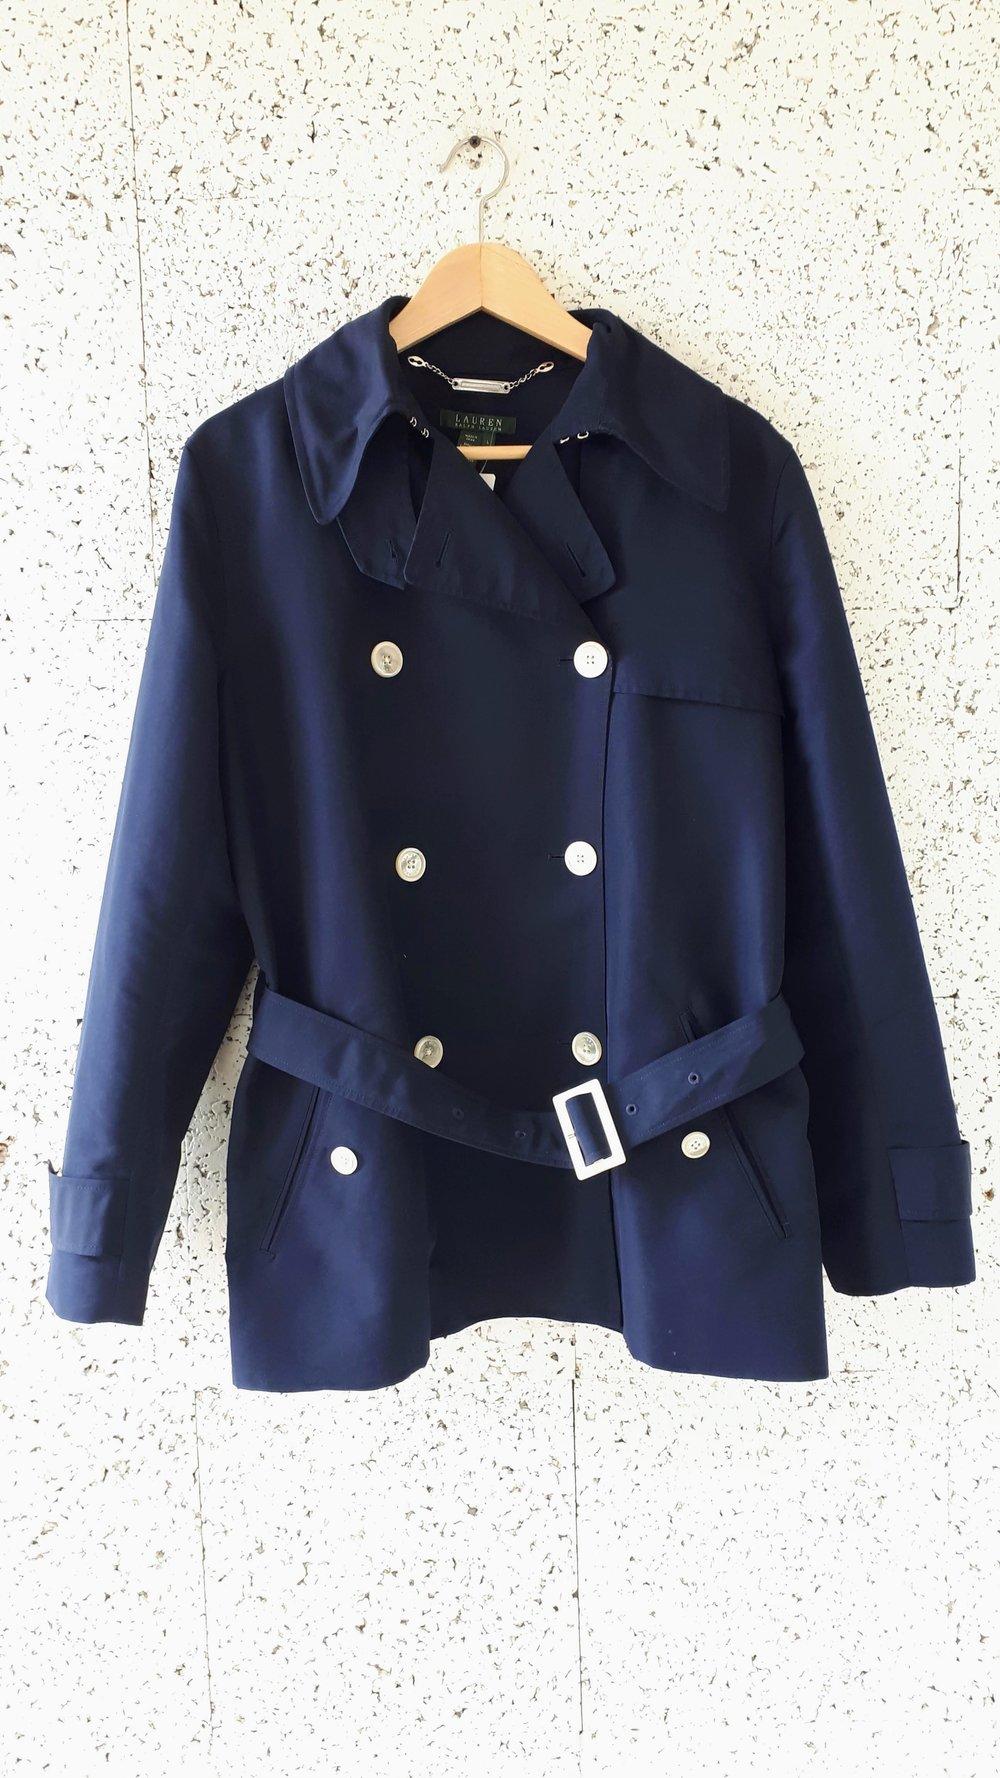 Ralph Lauren coat; Size L, $52